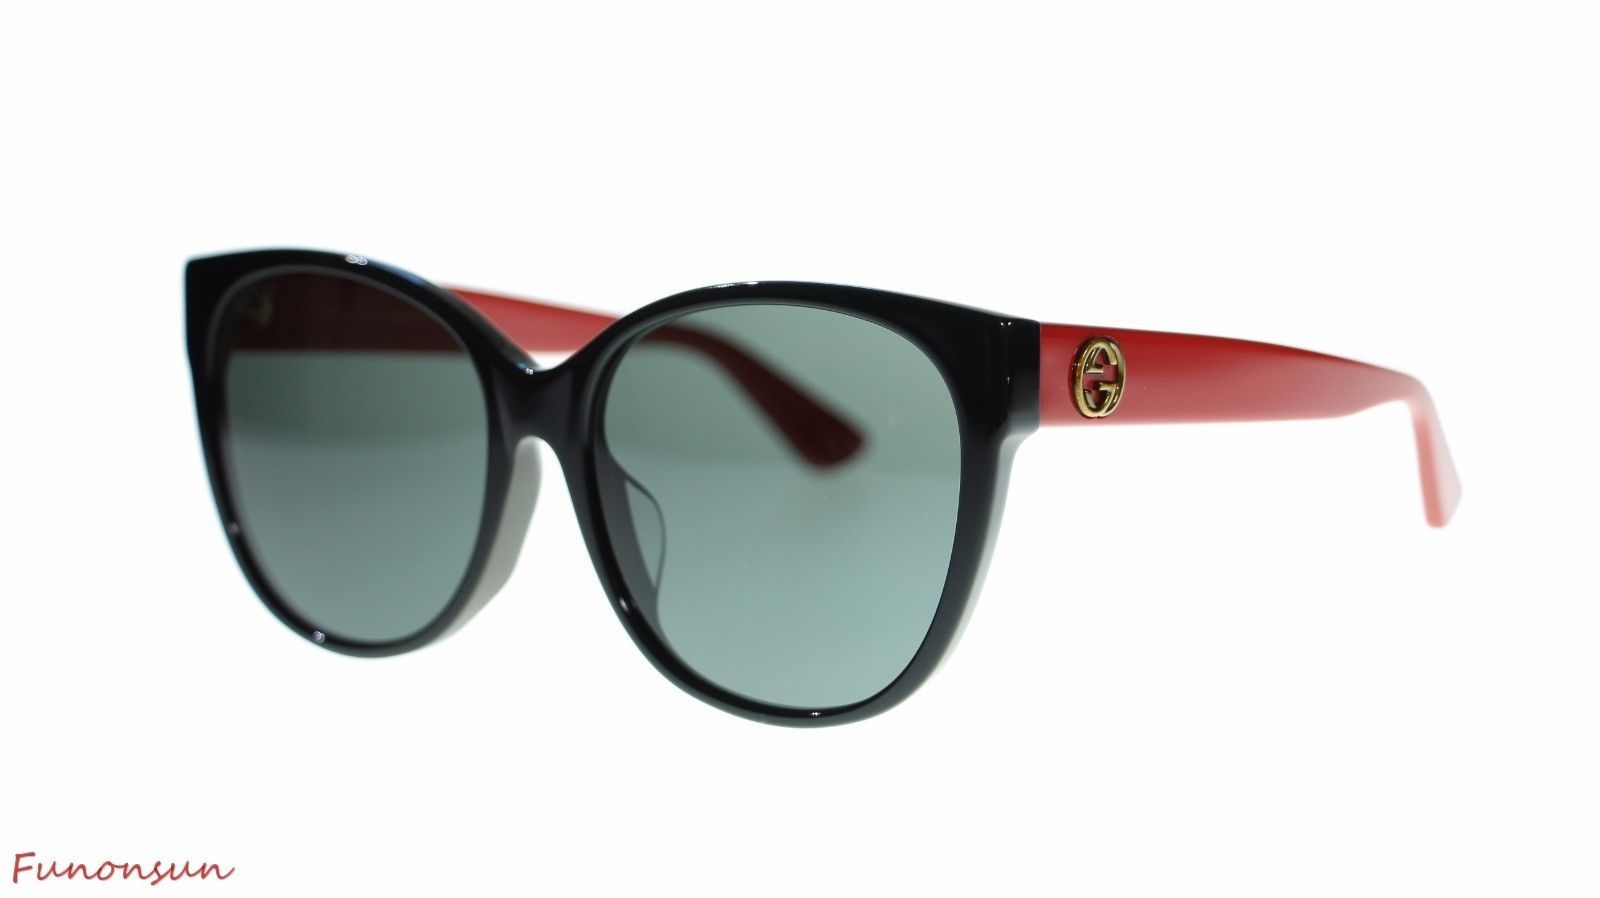 a9592db9912 S l1600. S l1600. Previous. Gucci Women Cat Eye Sunglasses GG0097SA 004  Black Red Grey Gradient Lens 58mm